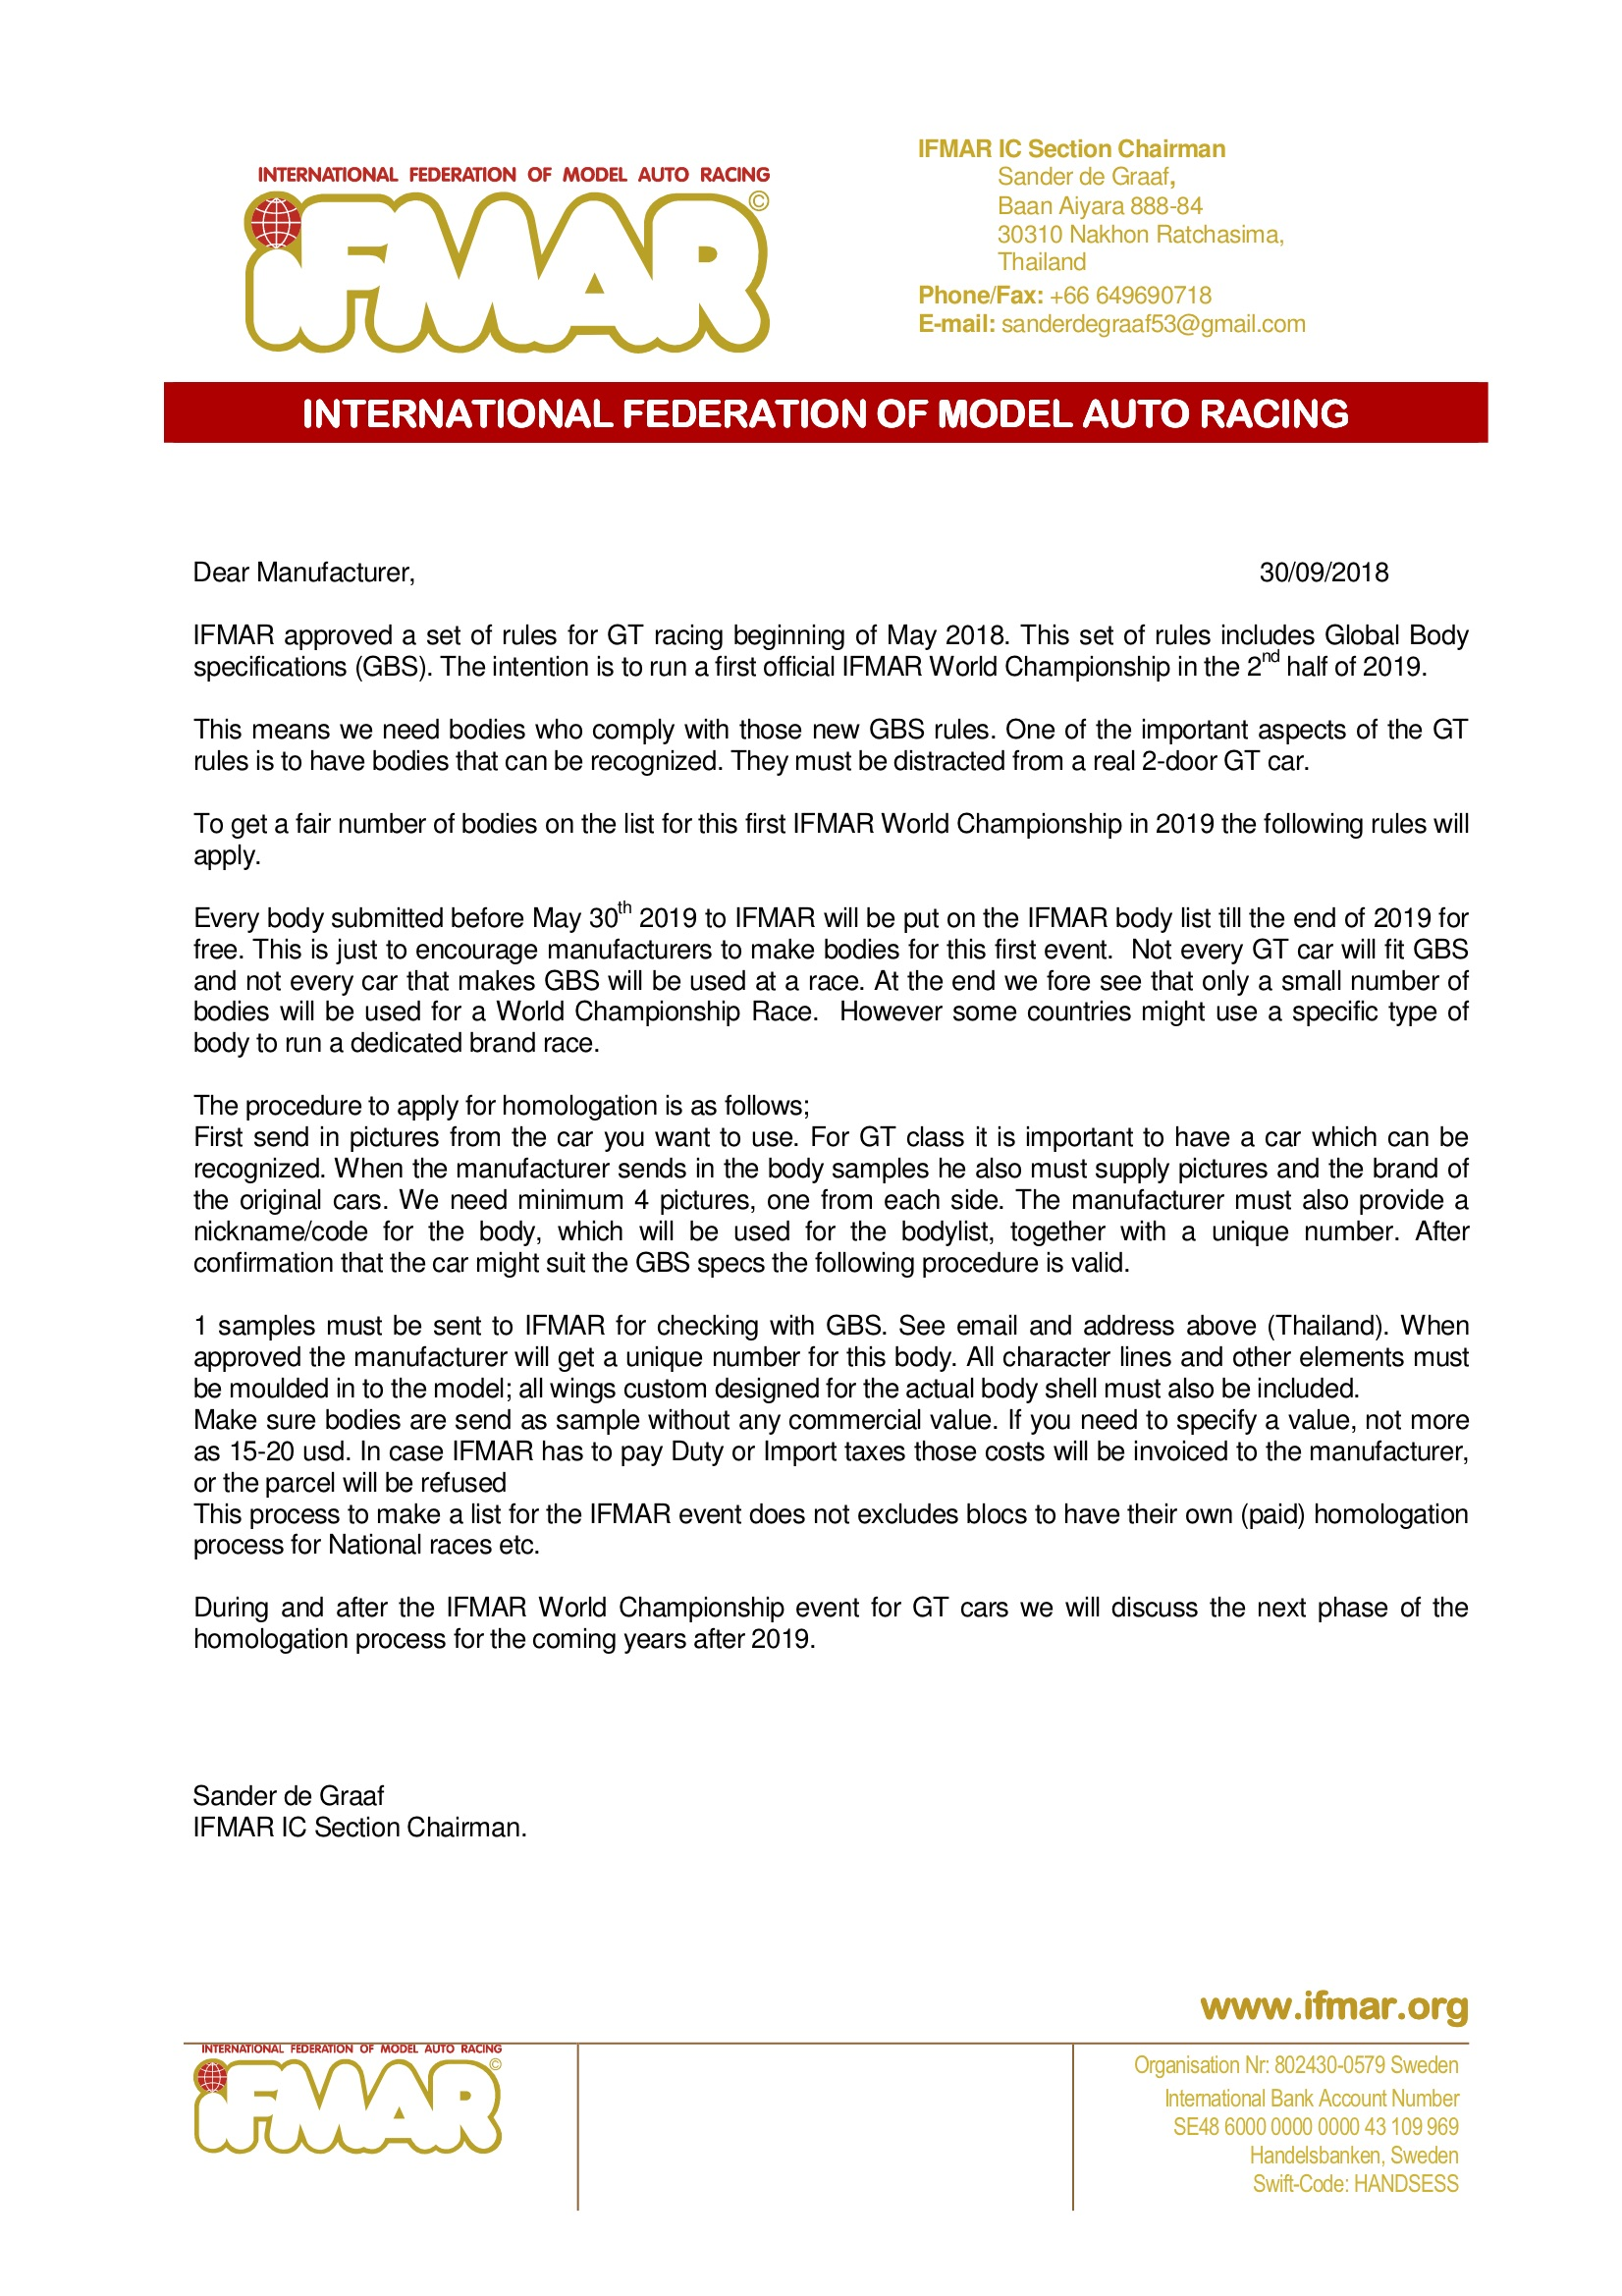 IFMAR GT Class GBS 2019 | FAMAR - Fourth Association of Model Auto